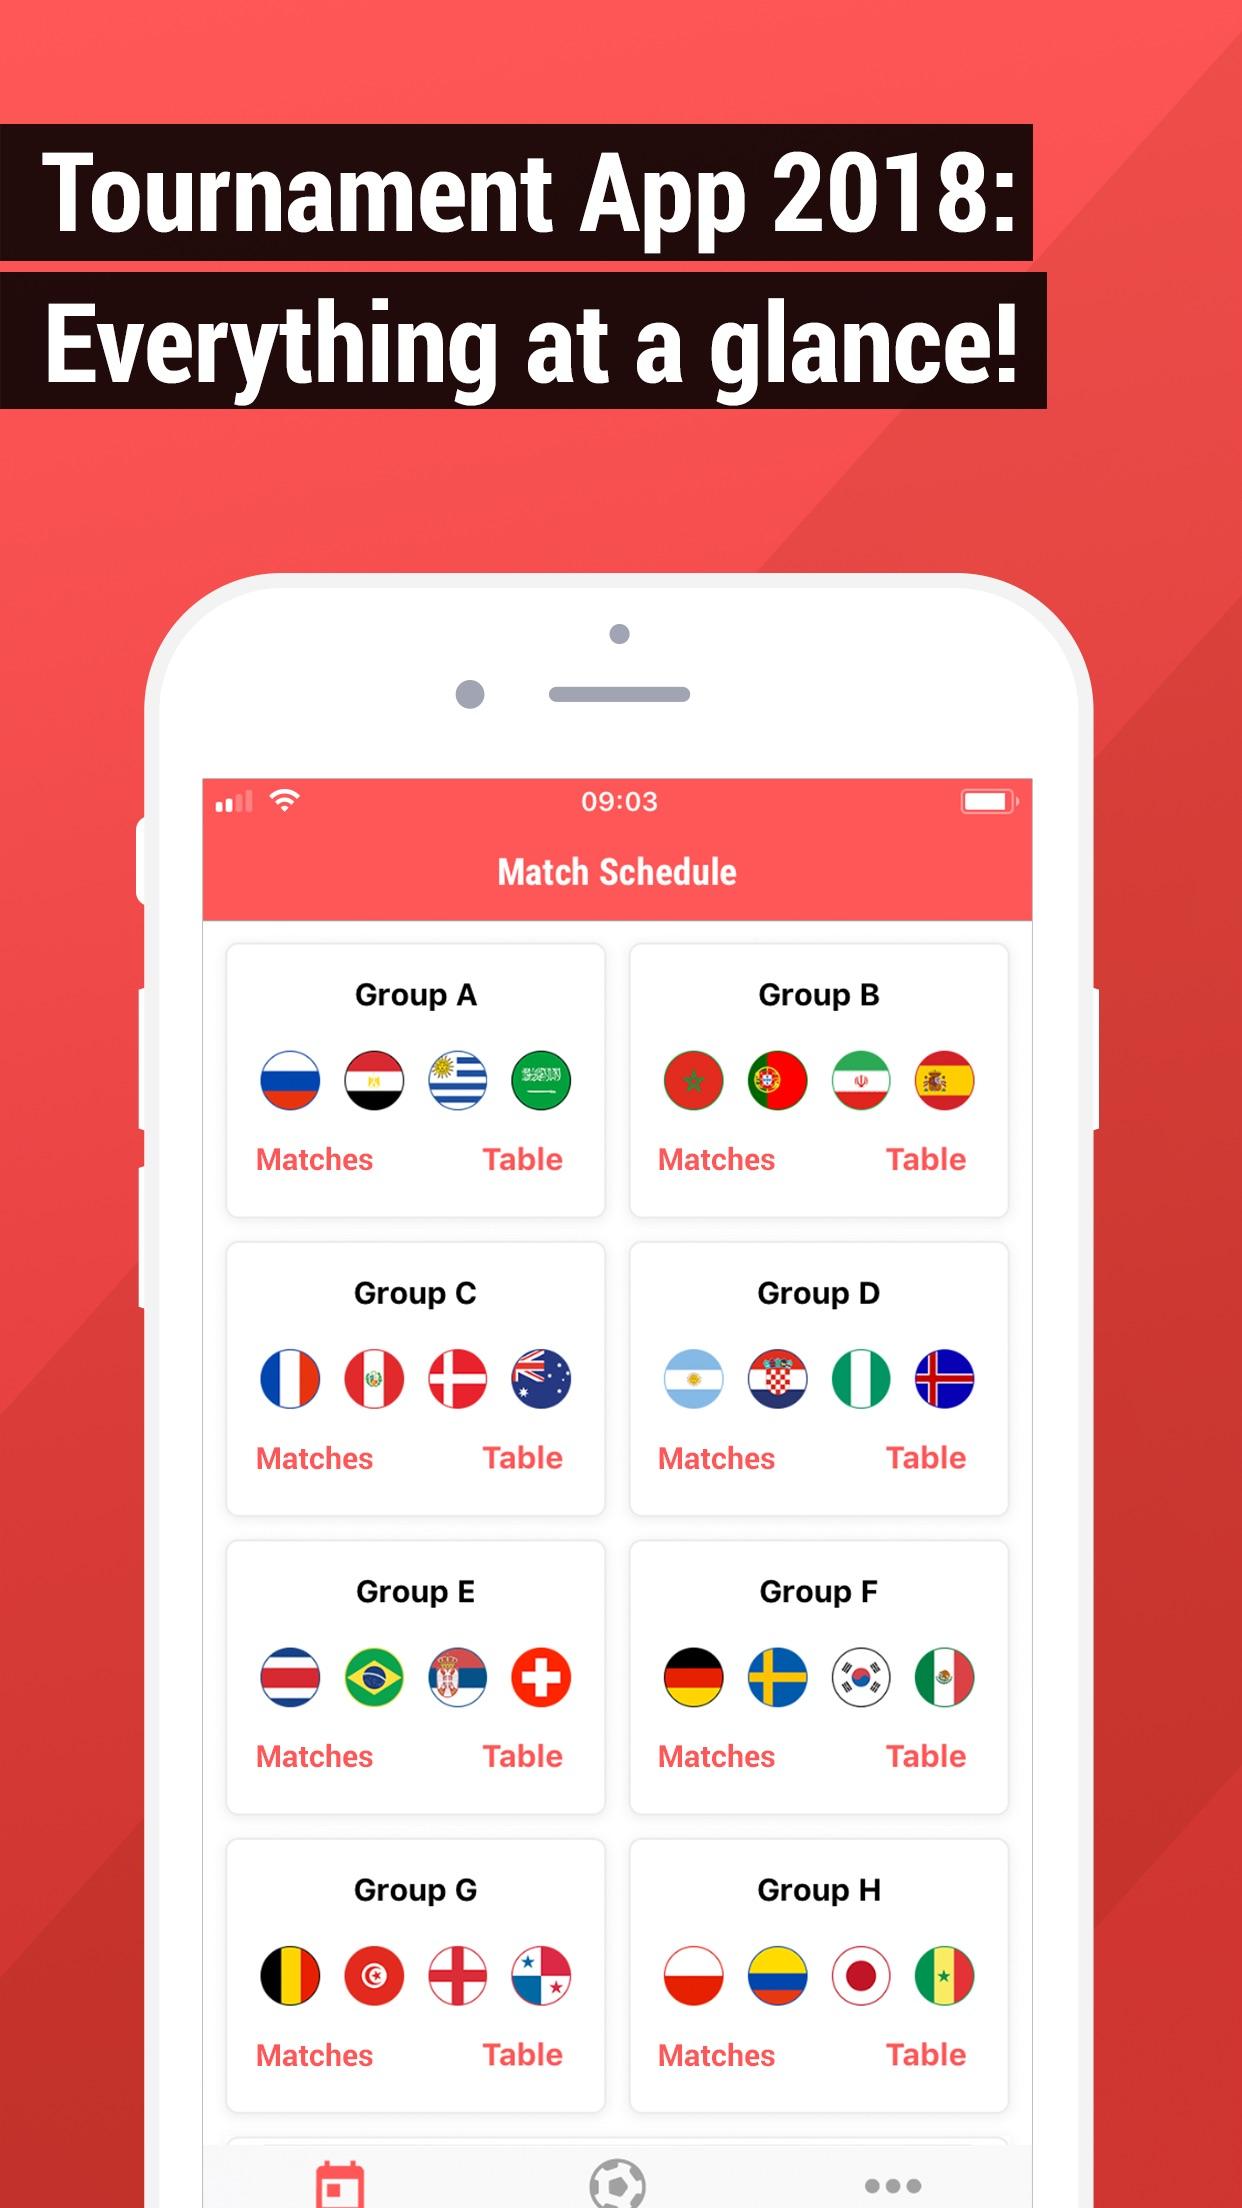 2018 Tournament App Screenshot